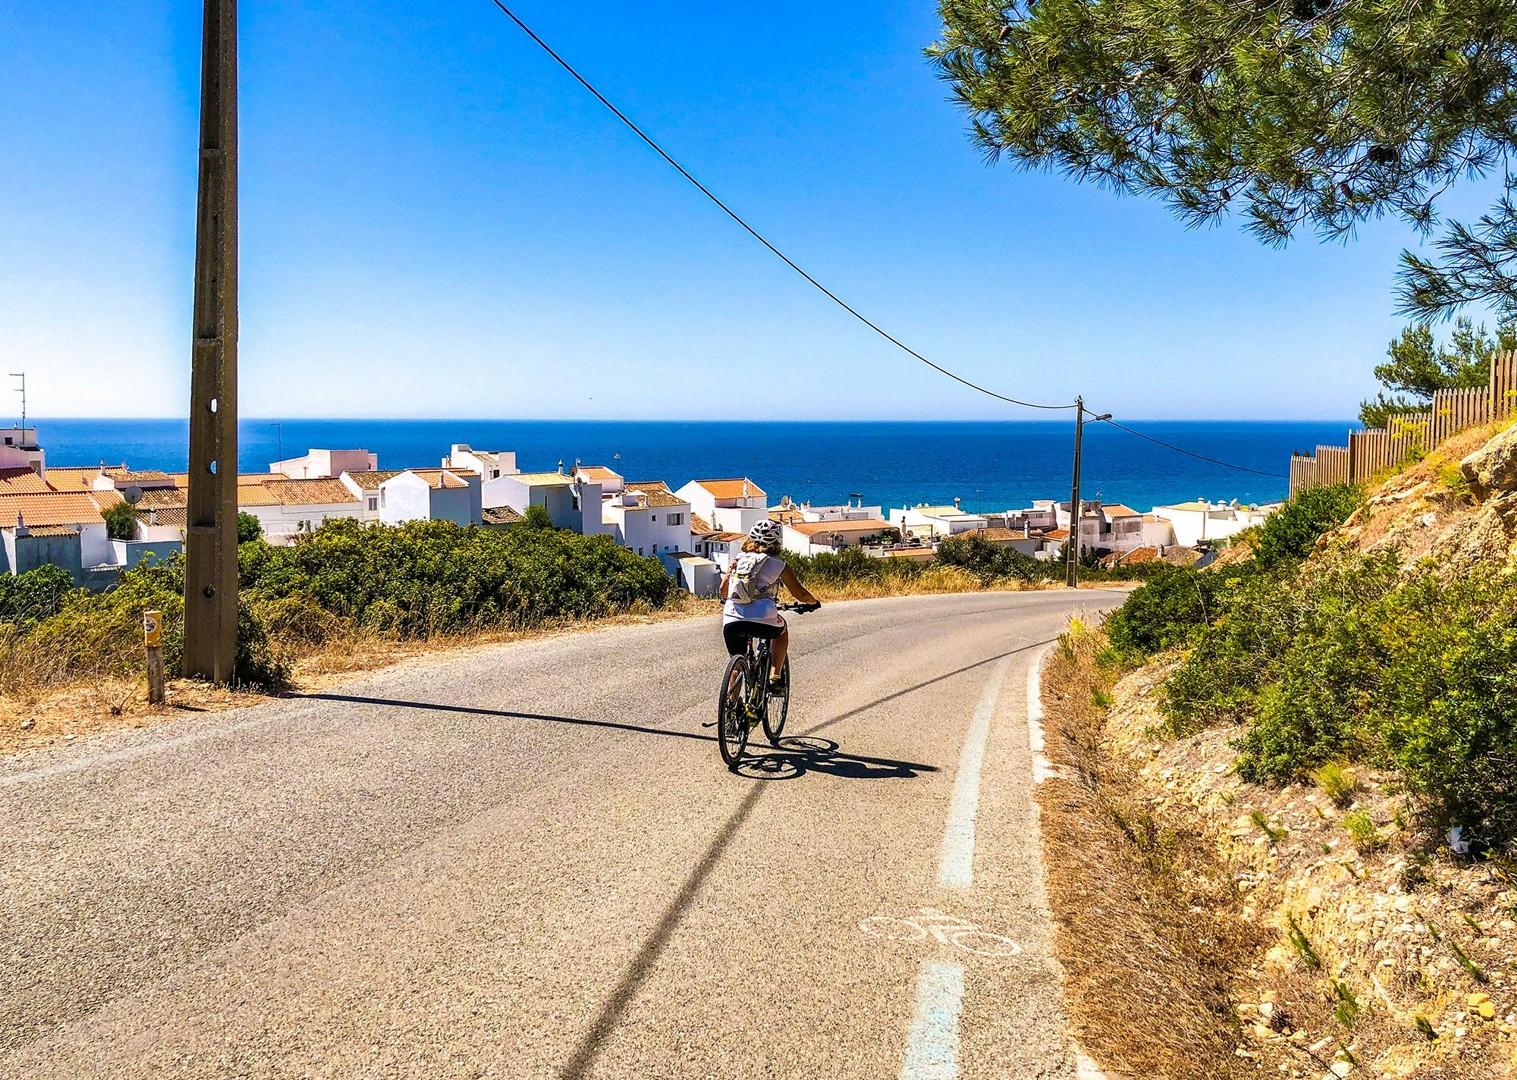 leisure-cycling-holiday-portugal-coastal-explorer-saddle-skedaddle.jpg - Portugal - Alentejo and Algarve Coastal Explorer - Self-Guided Leisure Cycling Holiday - Leisure Cycling